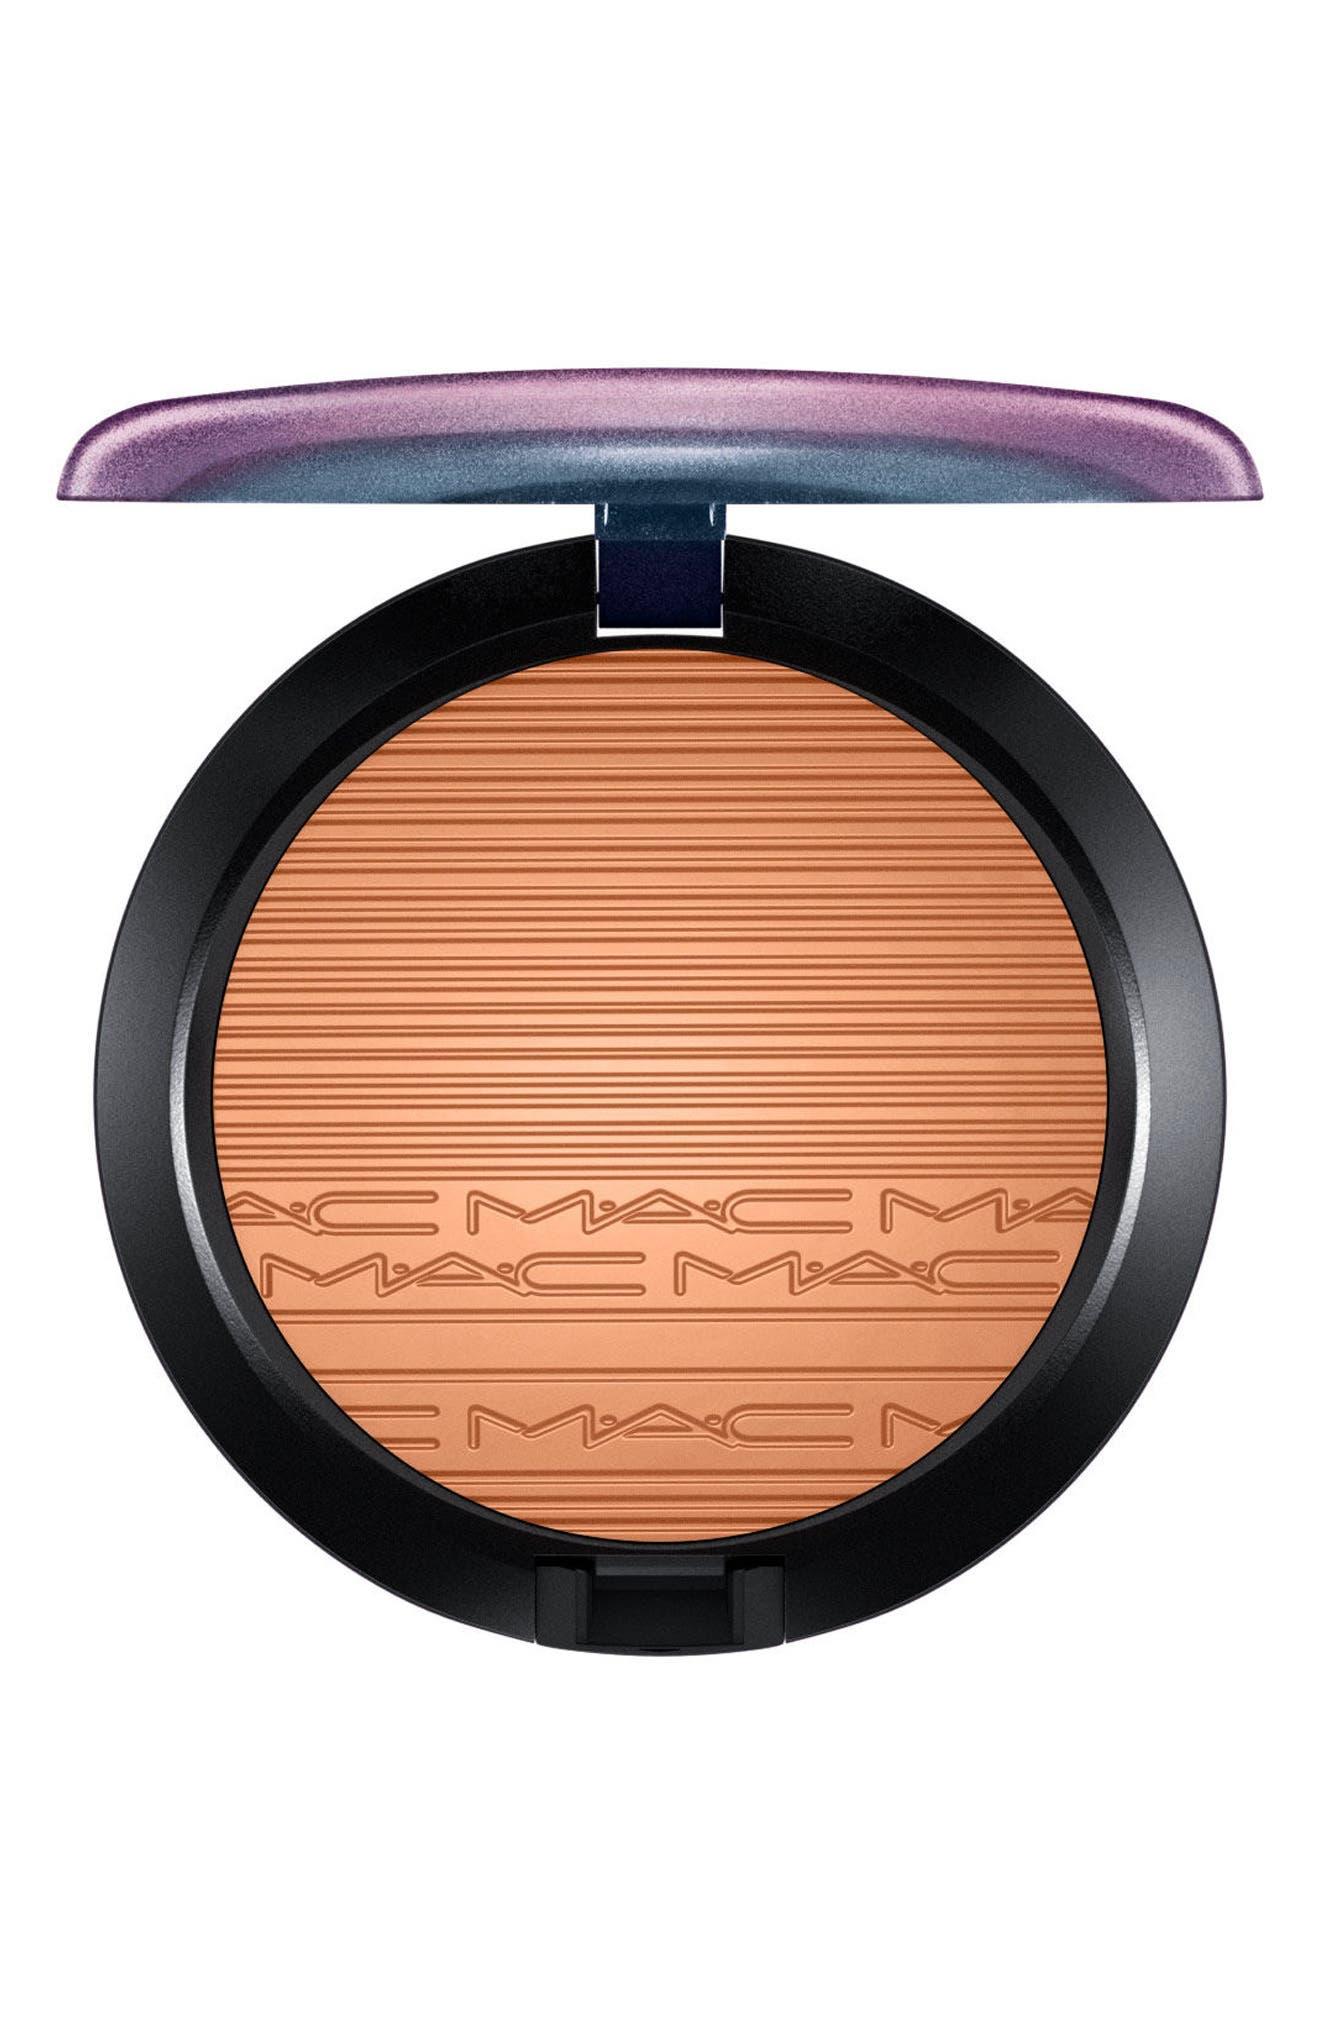 MAC Mirage Noir Extra Dimension Bronzing Powder (Limited Edition)